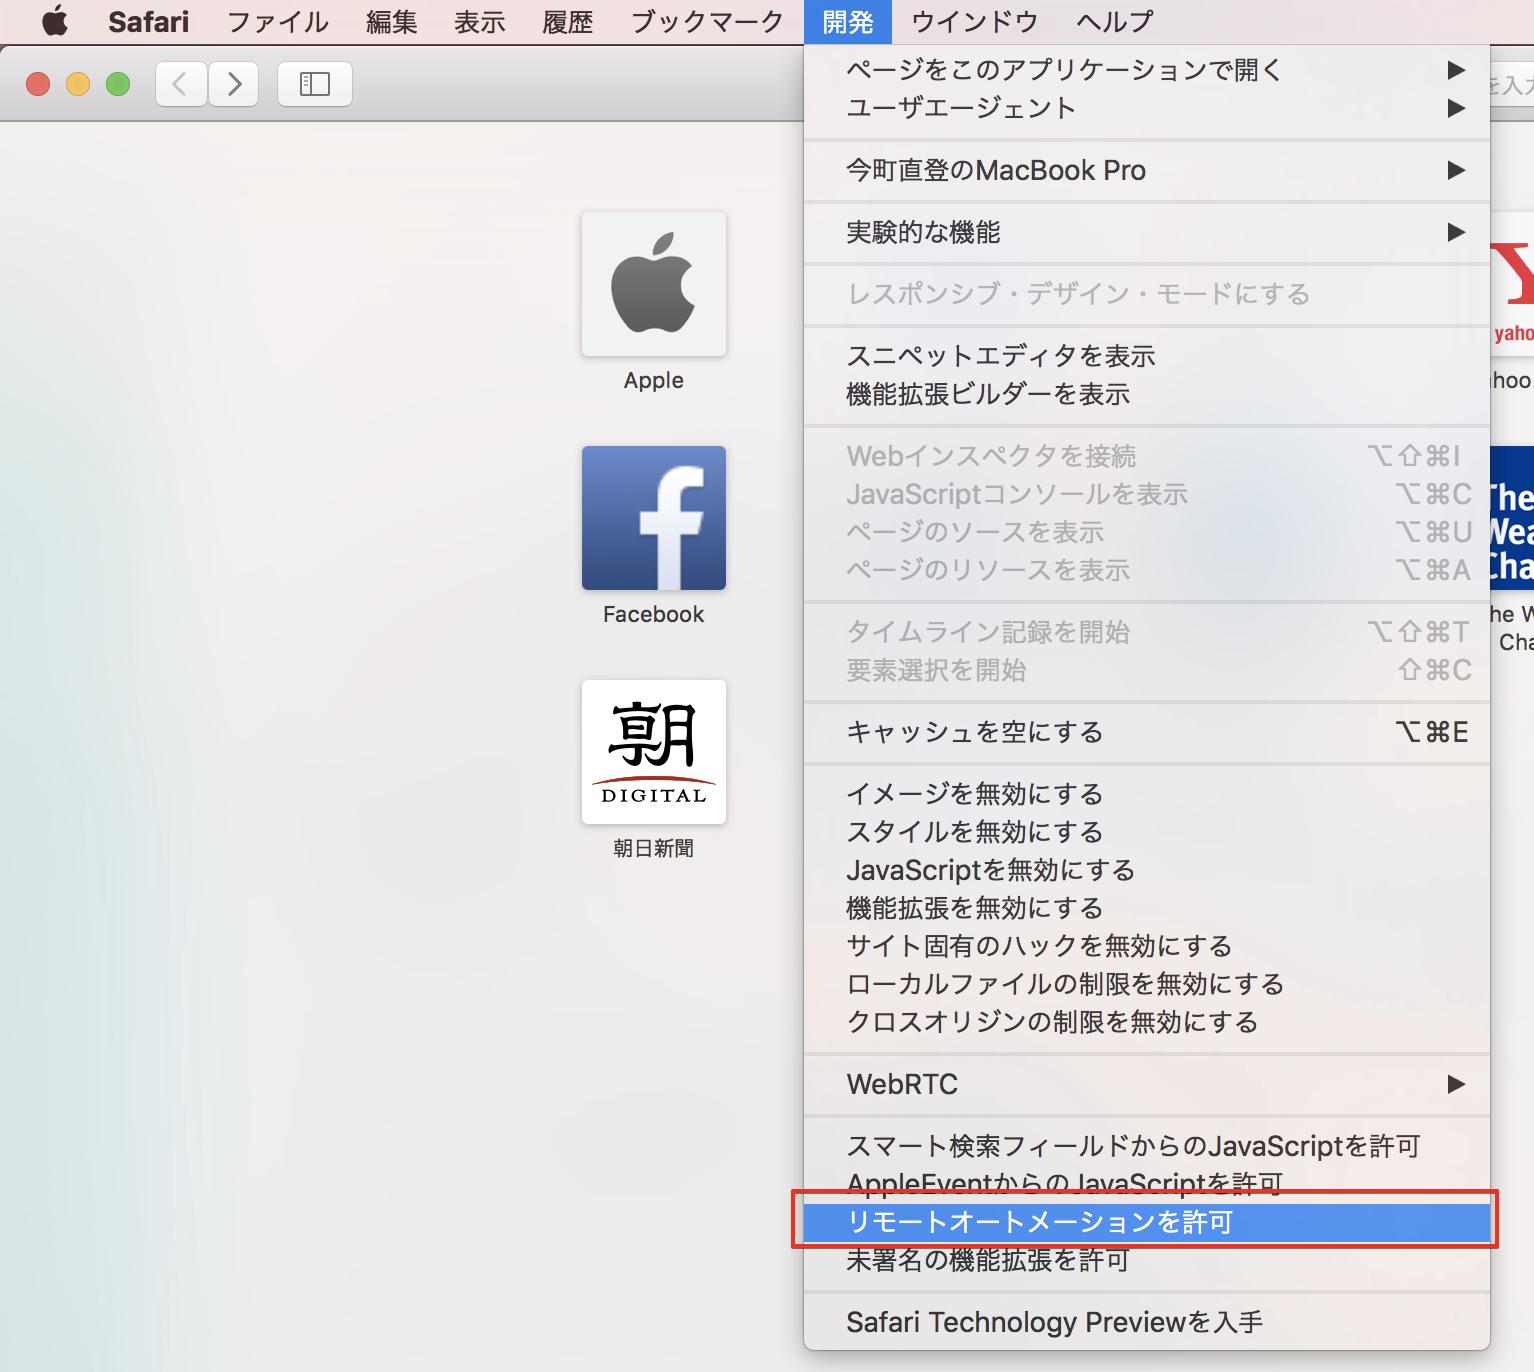 image.png (1.1 MB)